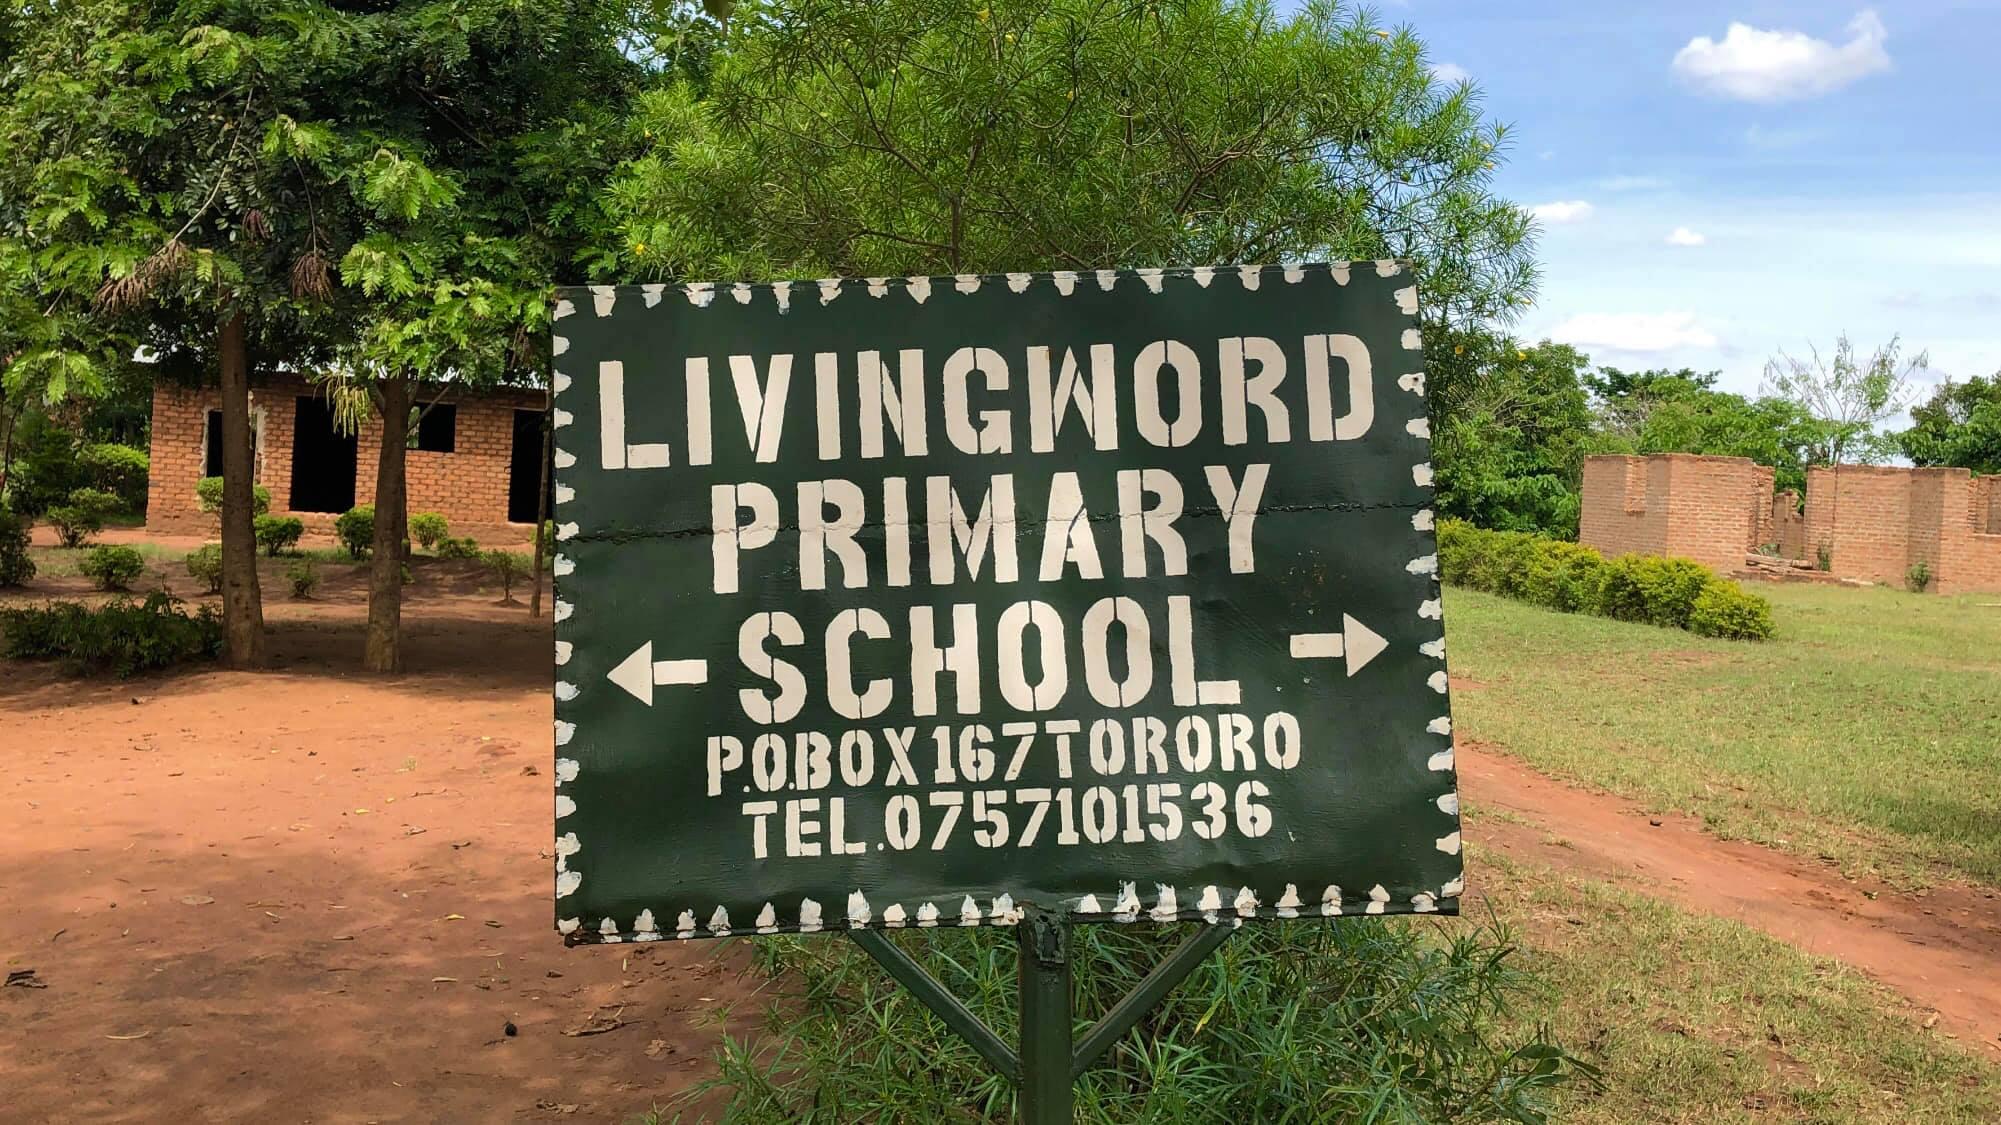 The Living Word Primary School Uganda